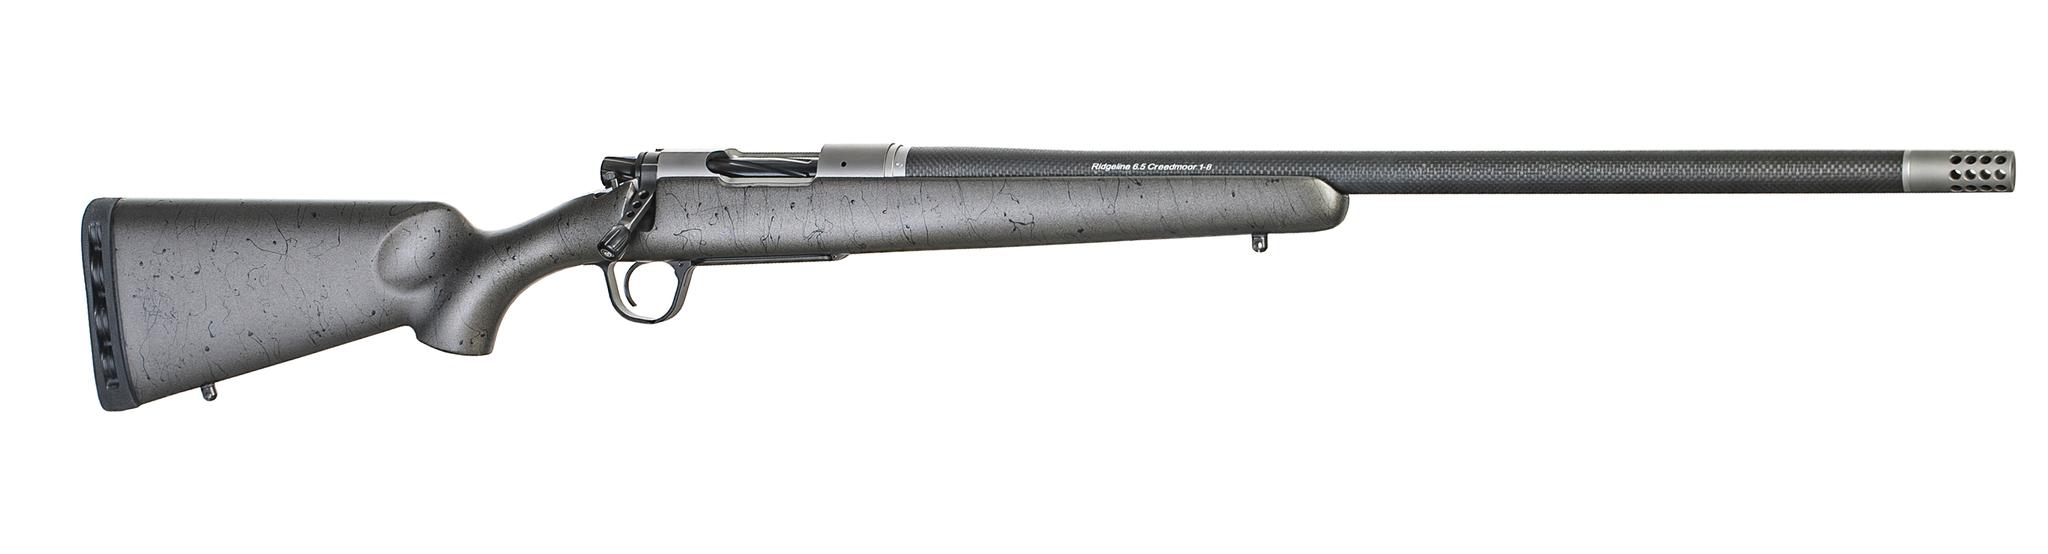 Christensen Arms Ridgeline Titanium 308 Win